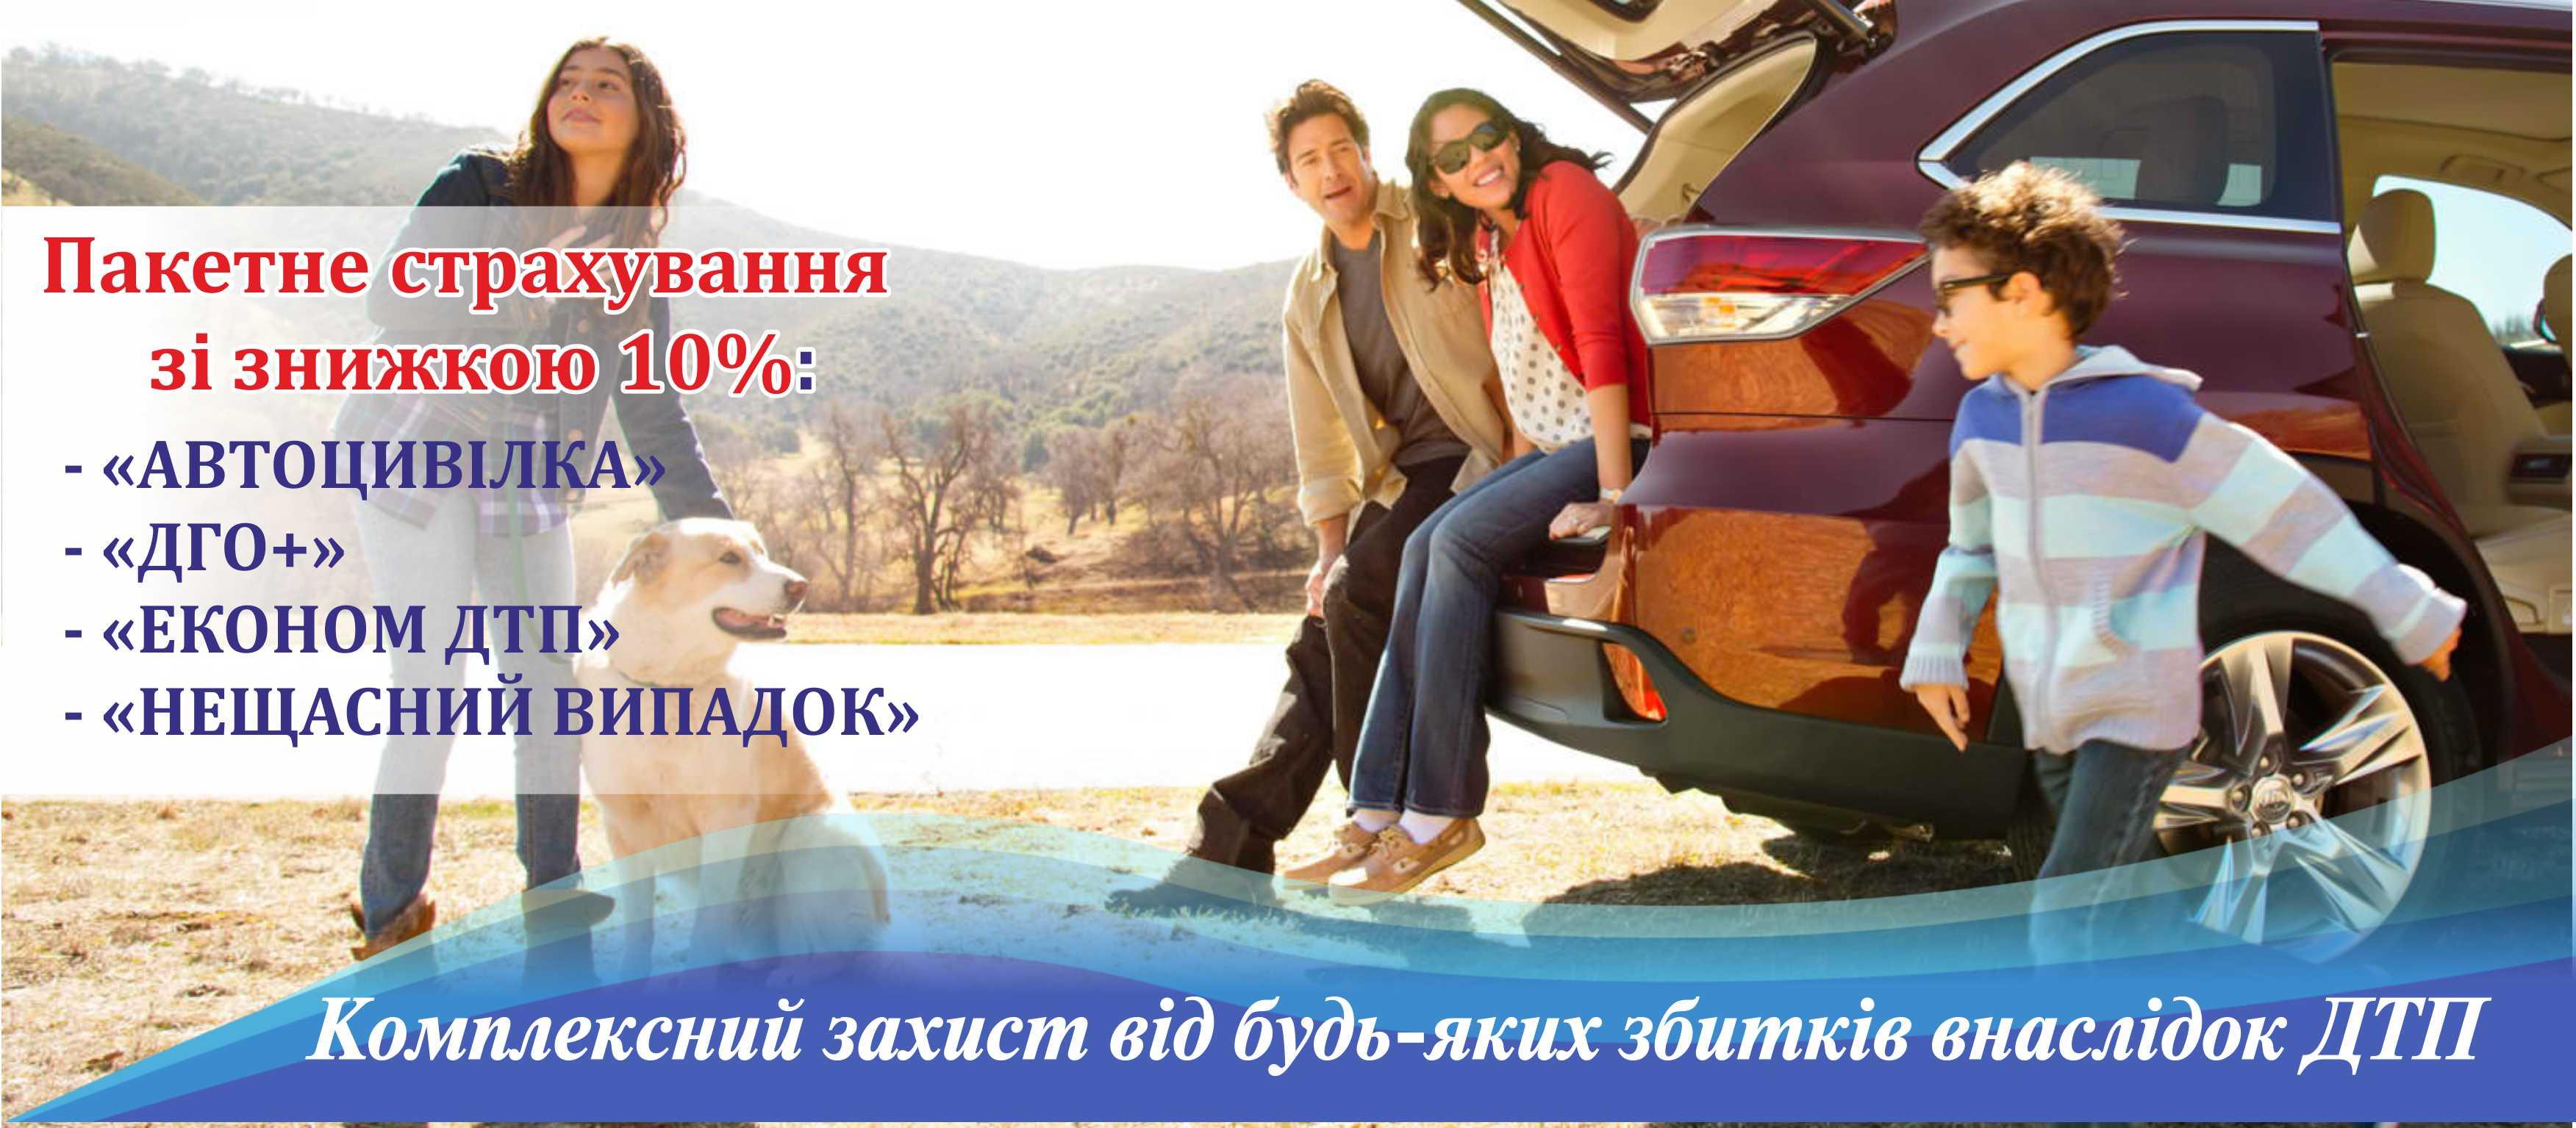 автопакет, пакетне страхування